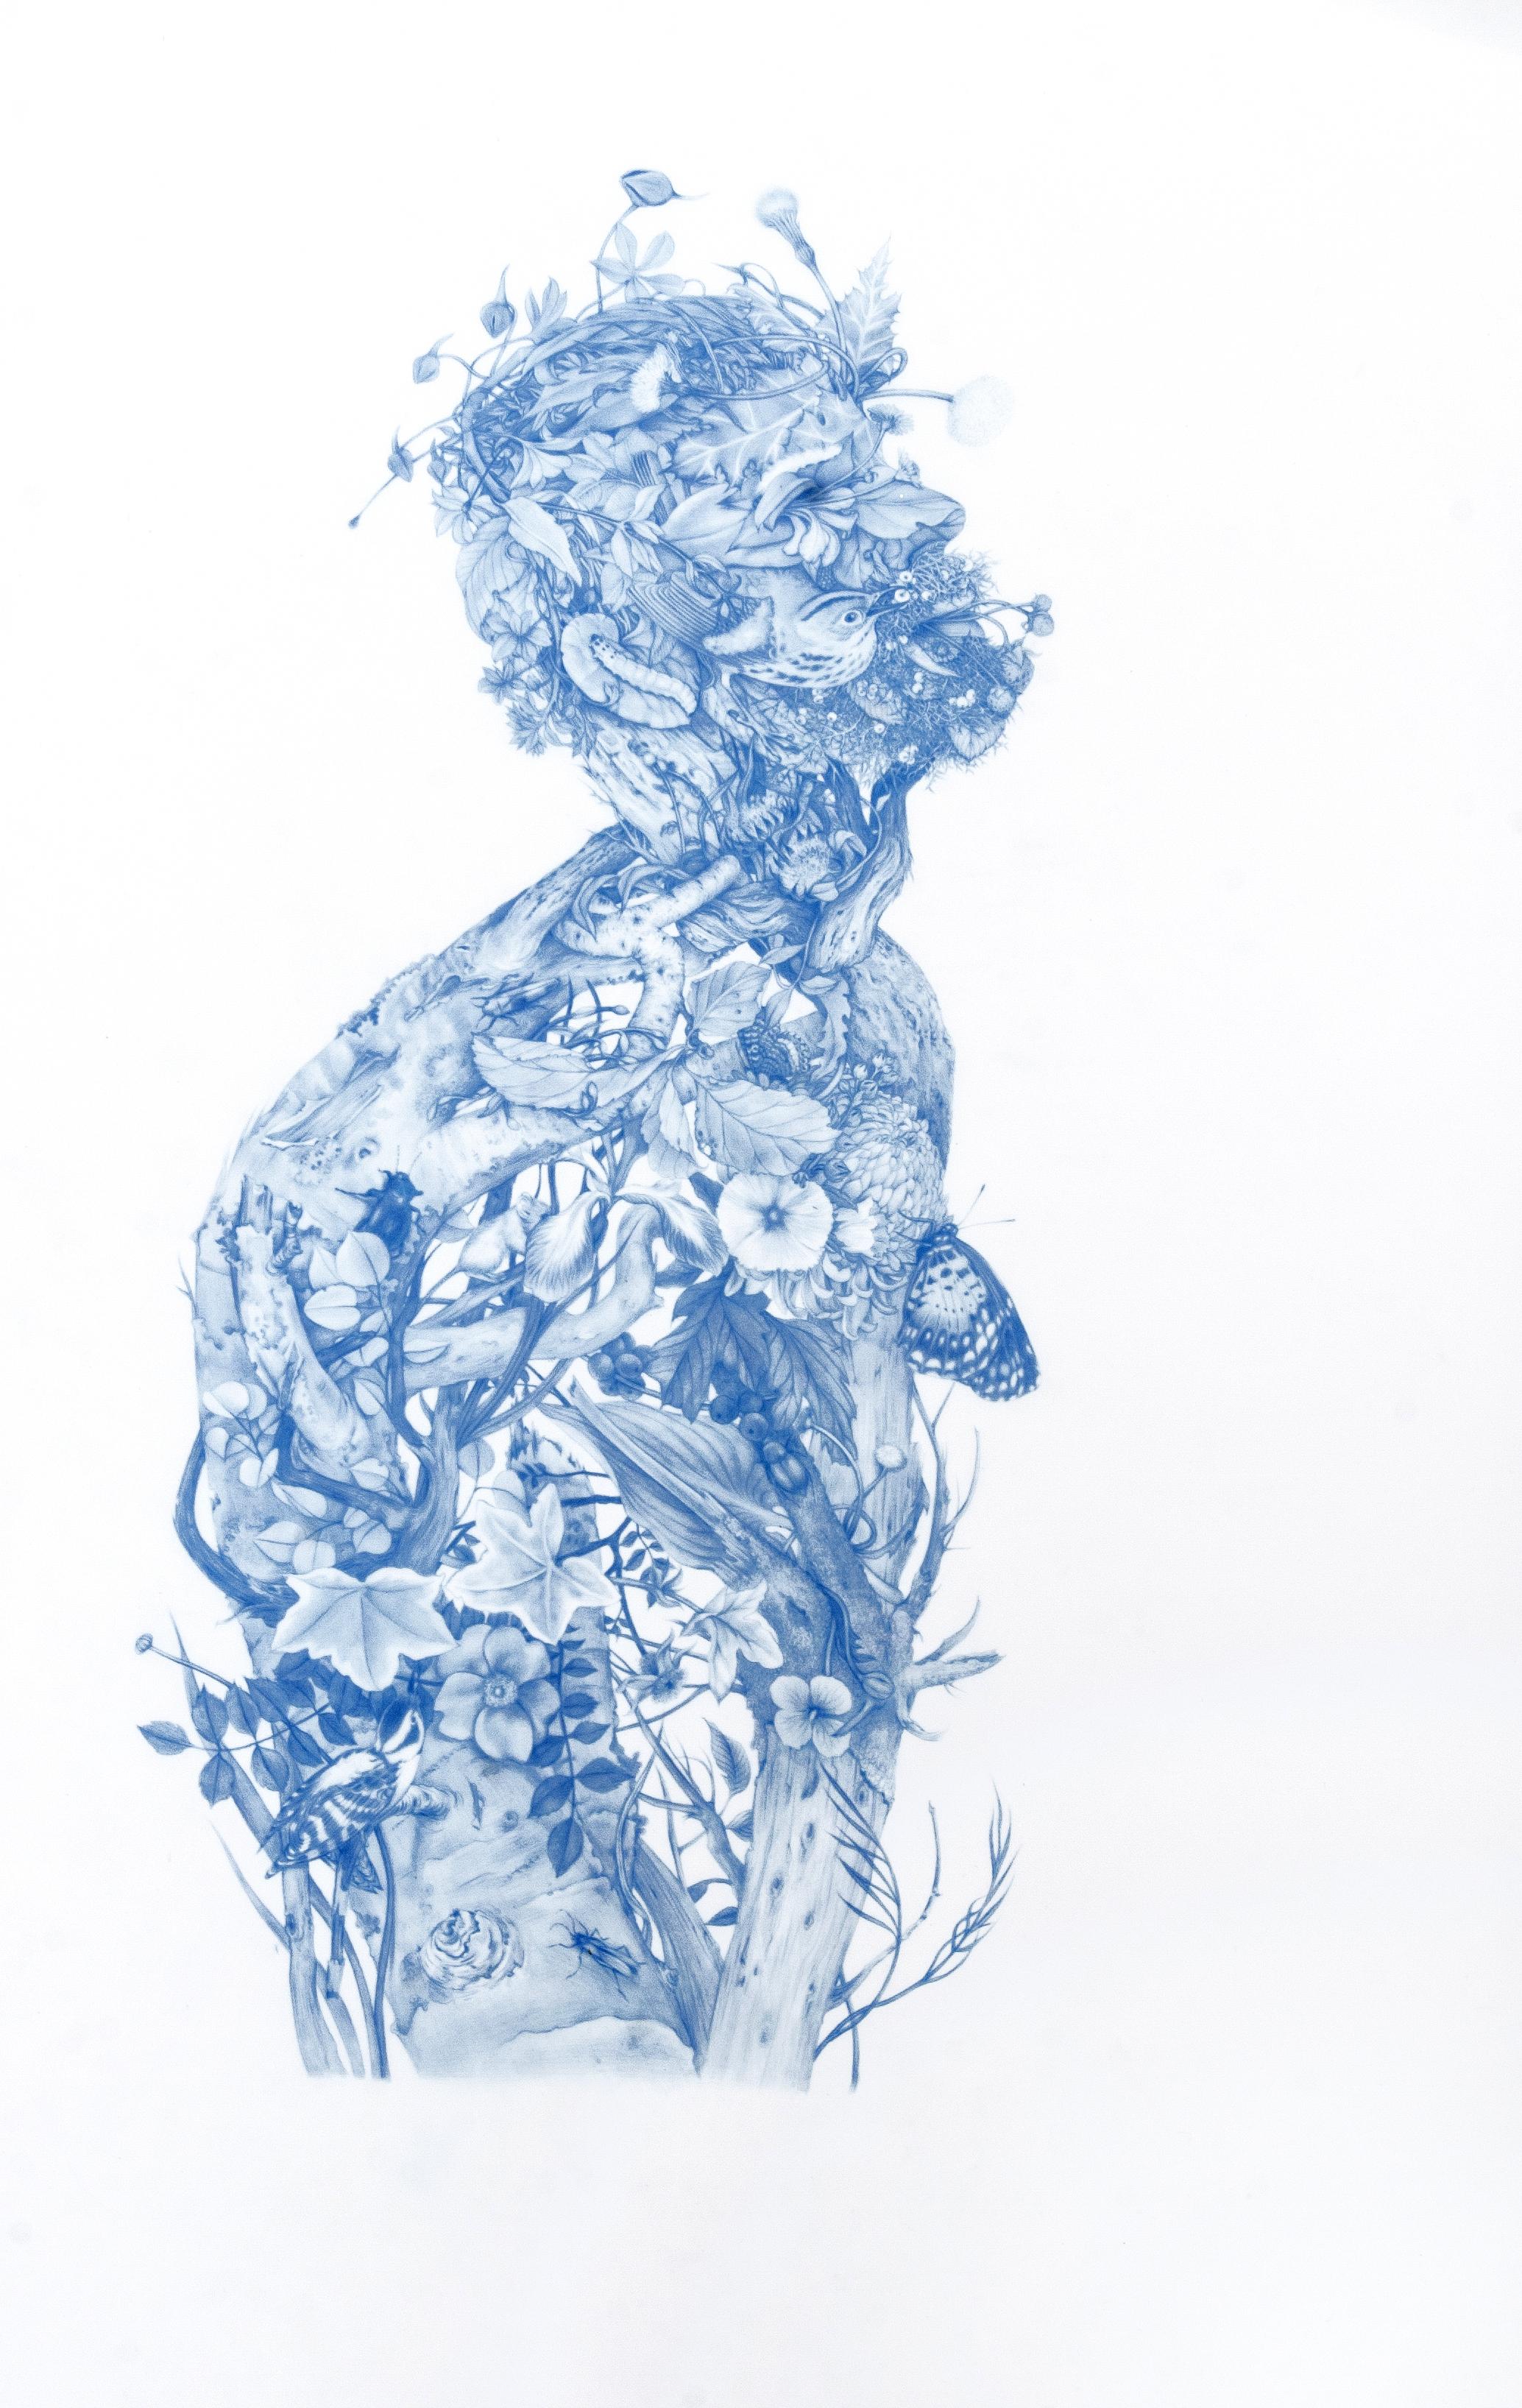 Zachari Logan, Green Man, 2014 blue pencil on mylar, 28 x 18 inches